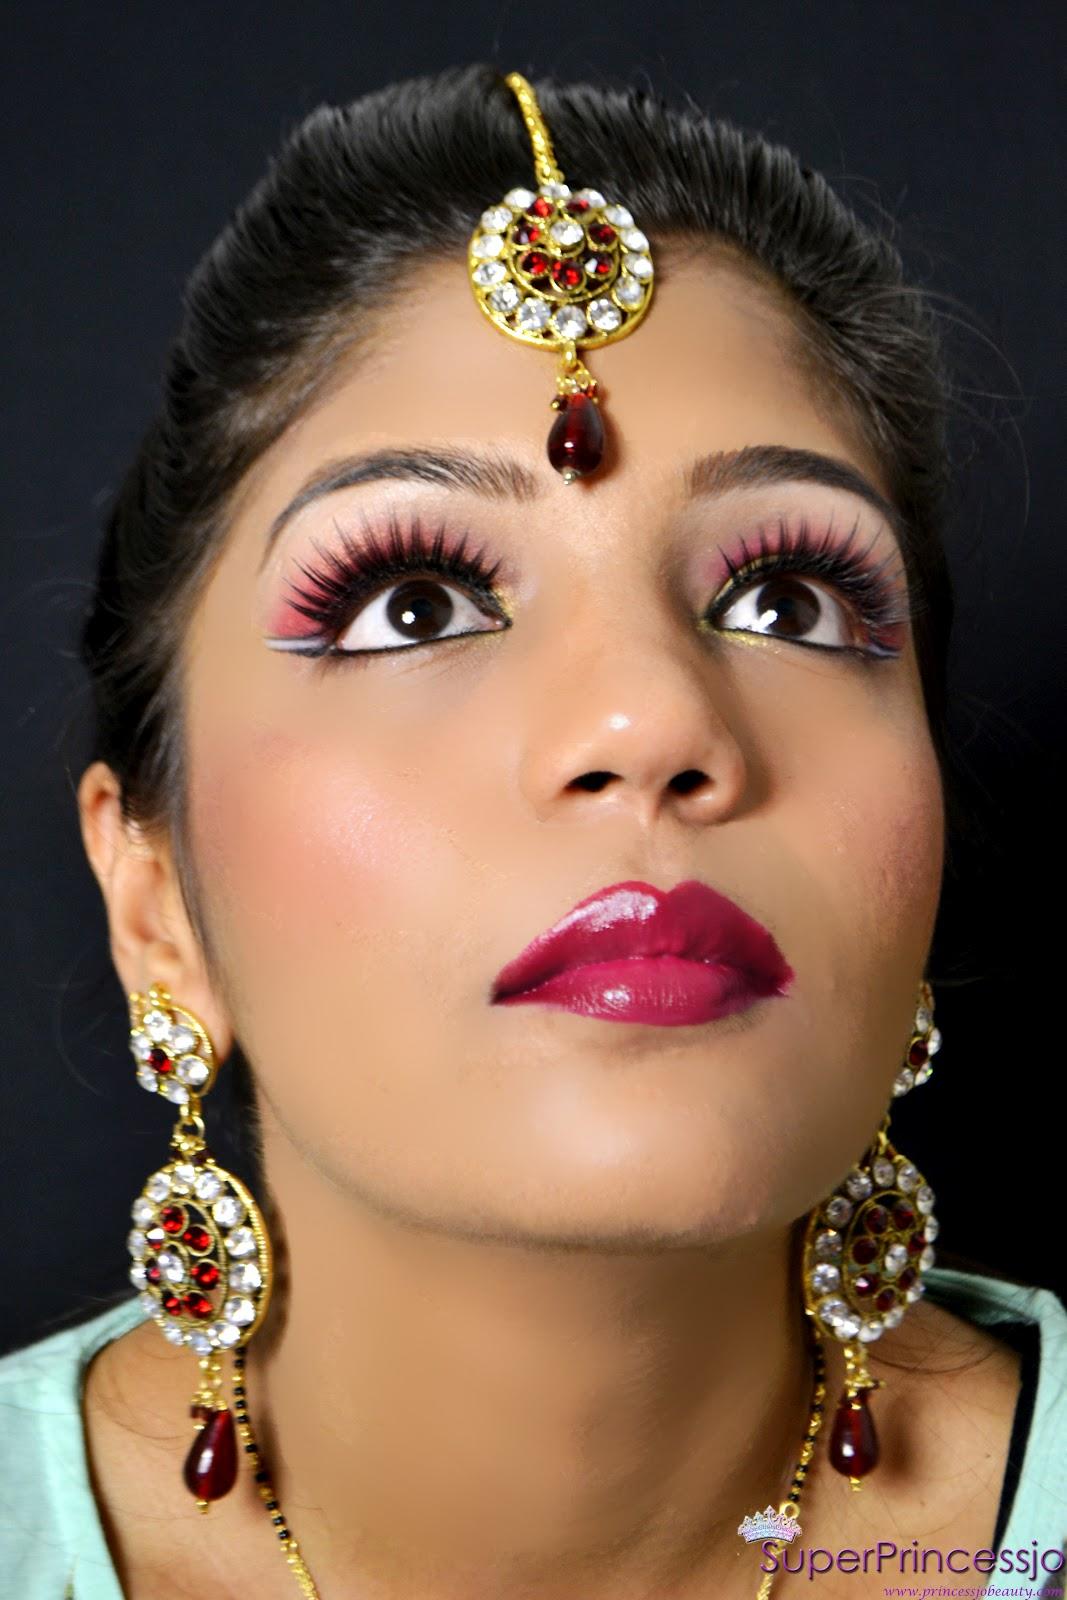 SuperPrincessjo : INDIAN BRIDAL WEDDING MAKEUP -RED GOLD ...